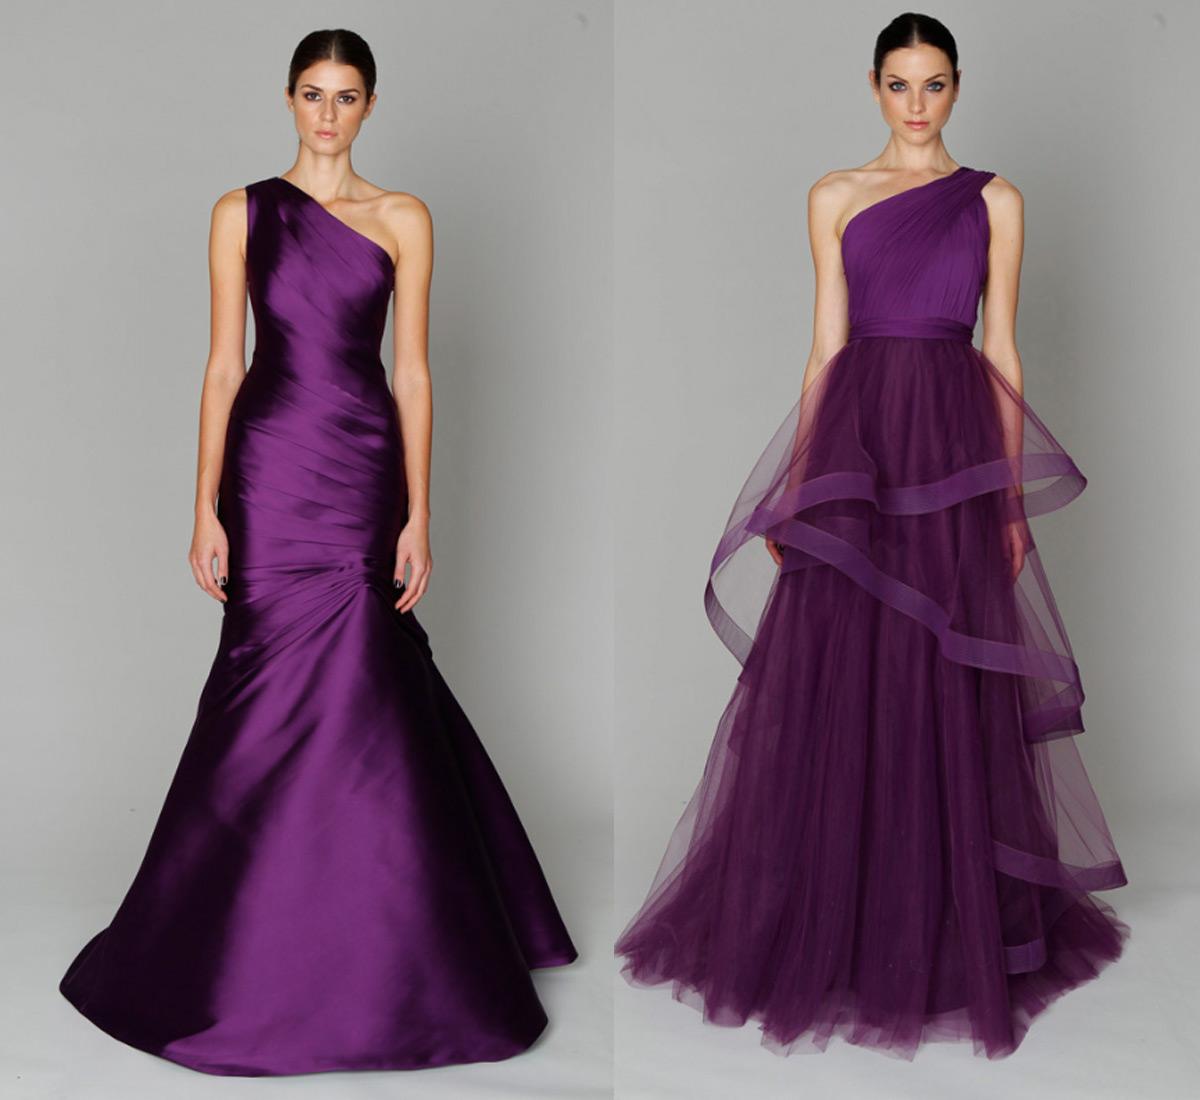 Cheap Wedding Gowns Online Blog: Monique Lhuillier Evening ...